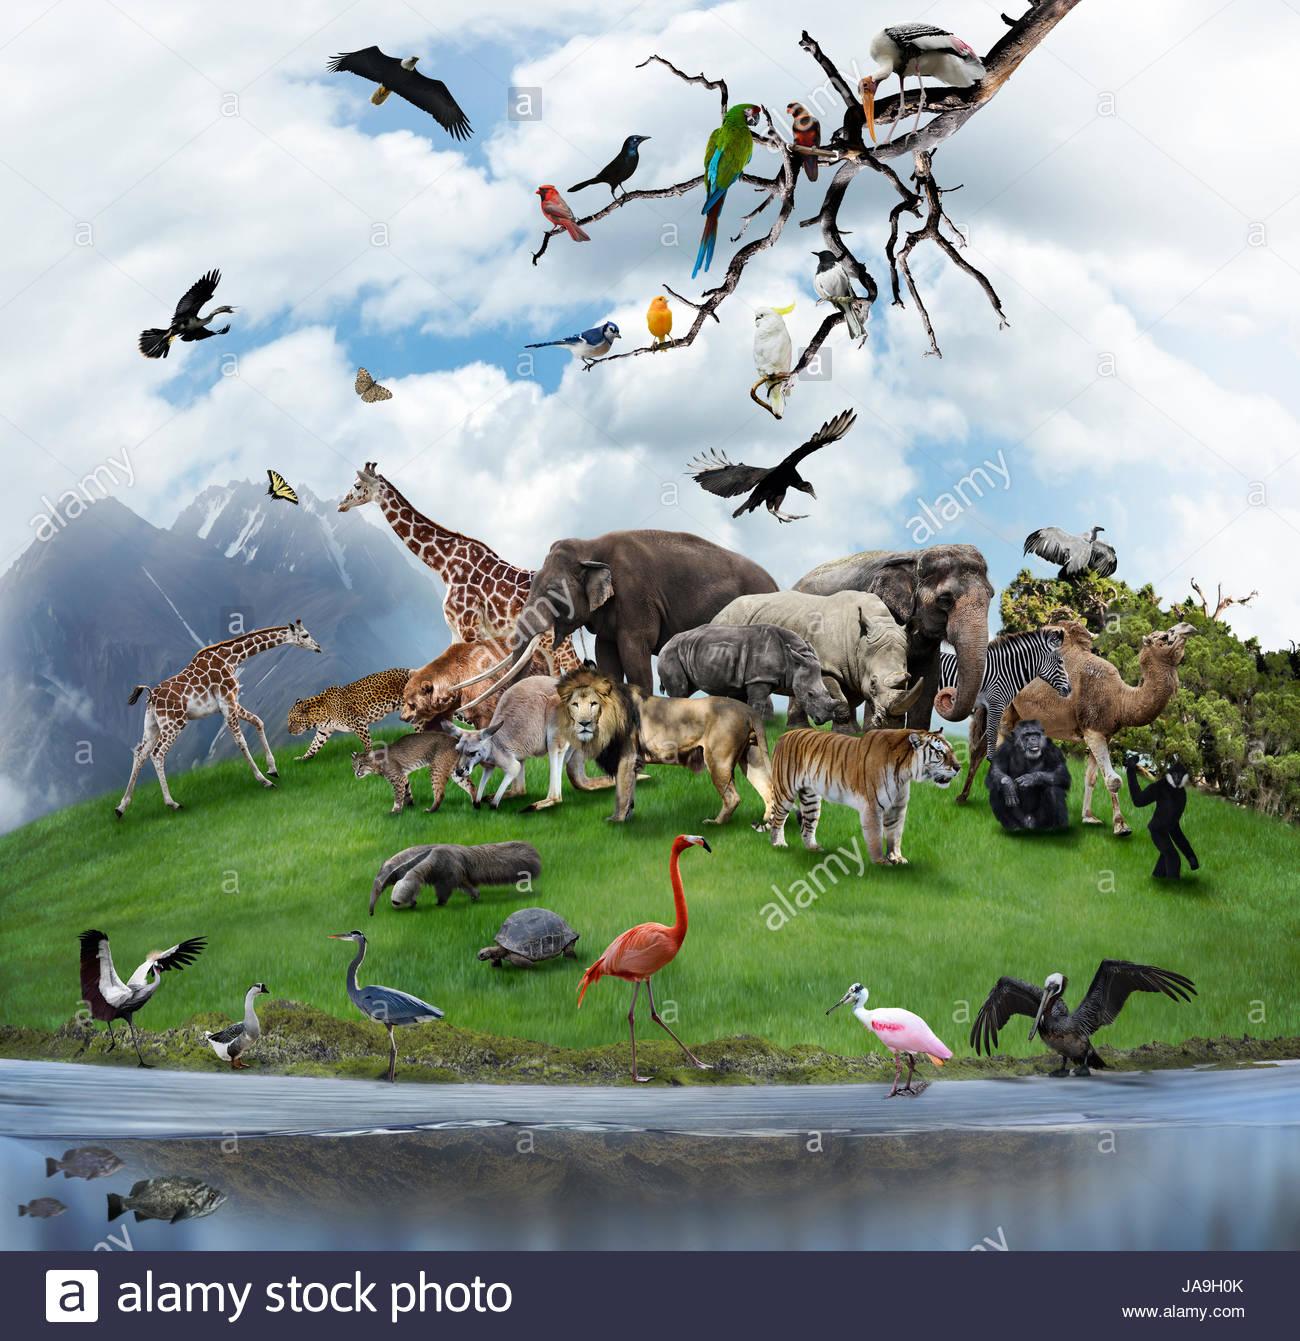 80 Gambar Model Fauna Paling Keren